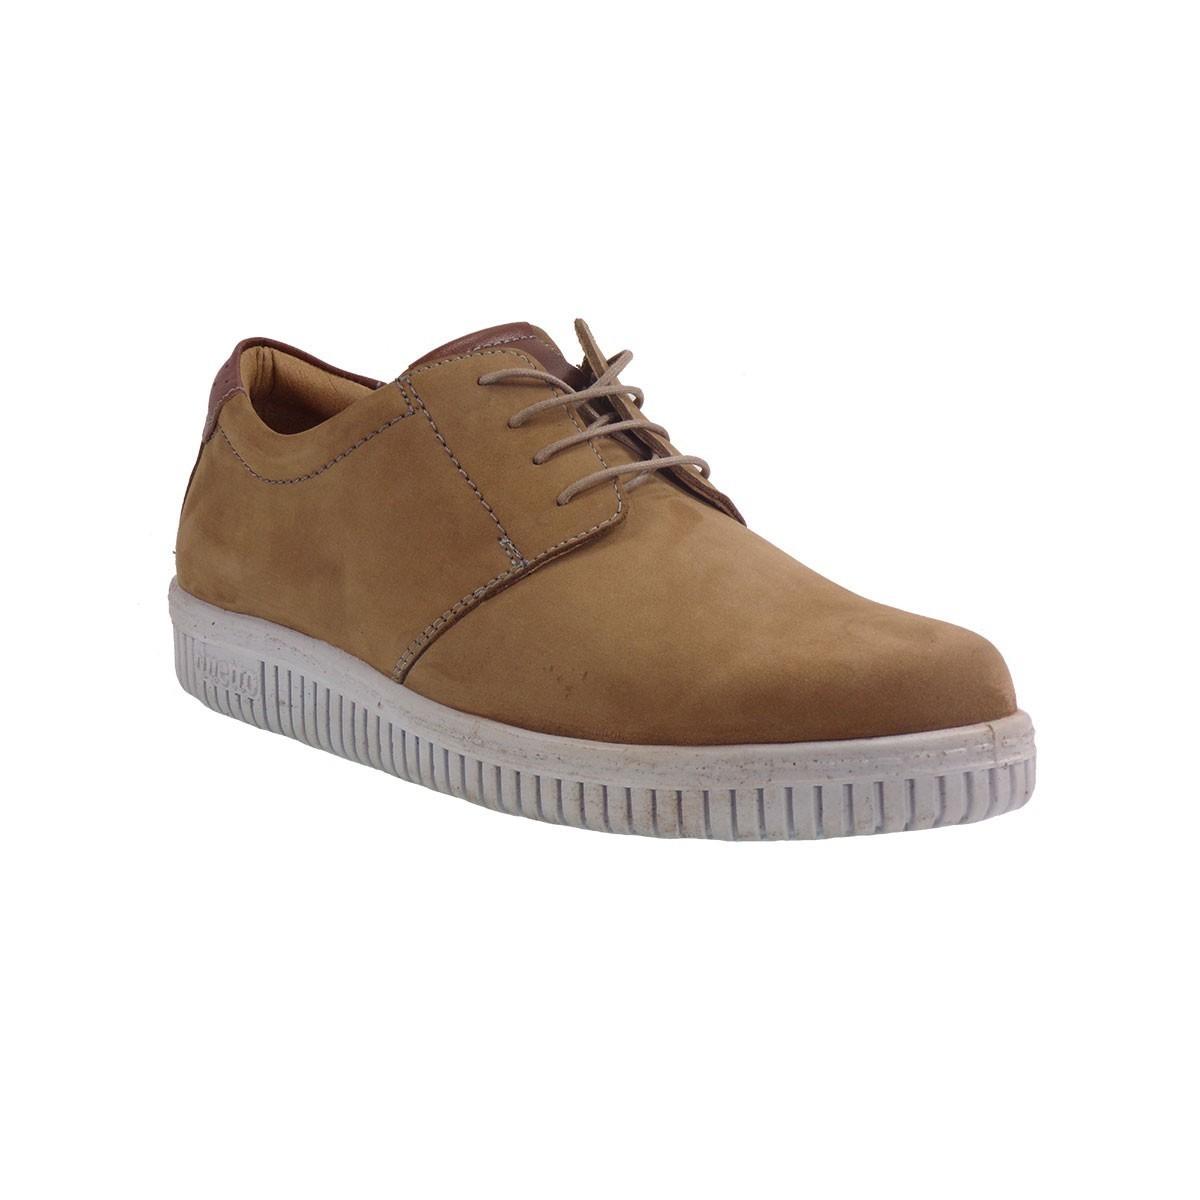 Aeropelma Duetto Ανδρικά Παπούτσια 209 Πούρο Δέρμα